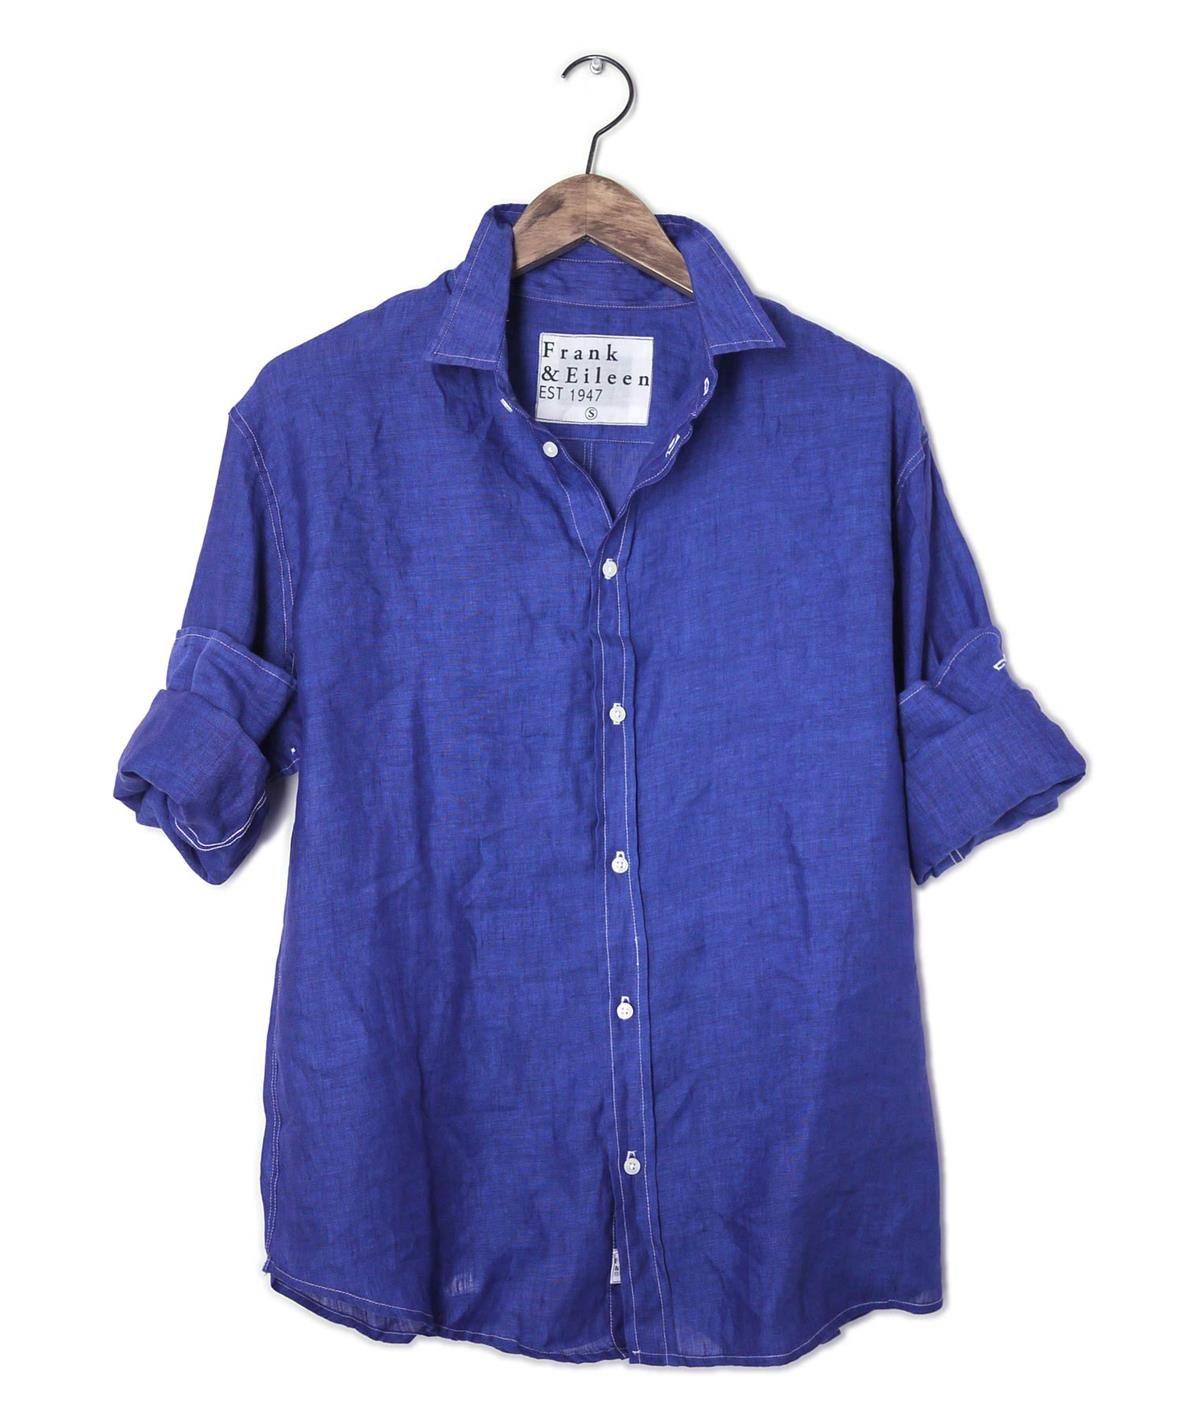 f25ba5c3 Royal blue linen shirt | Dream Clothes | Ropa, Camisas, Zapatos